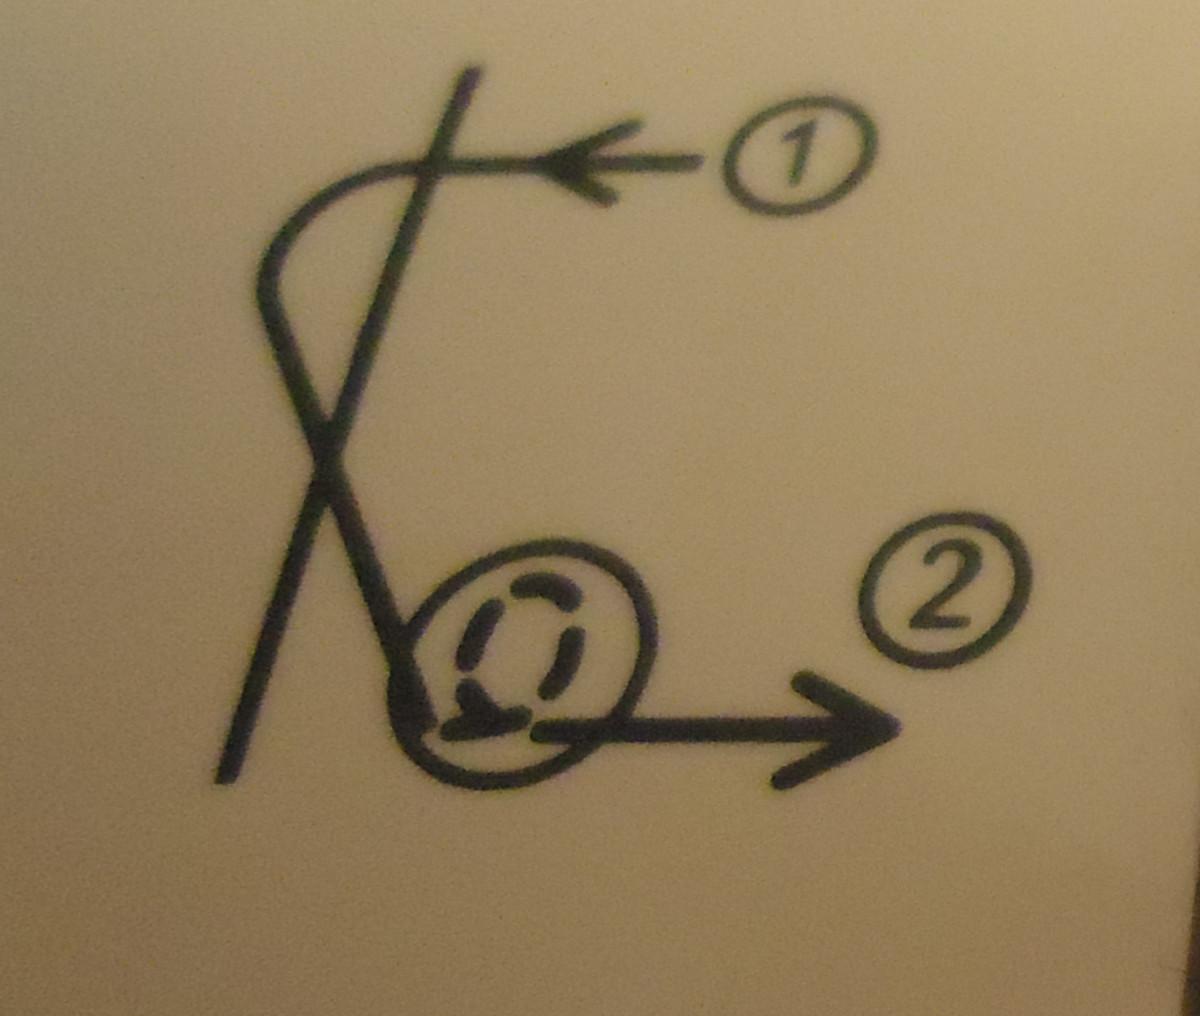 Bobbin threading diagram on the machine.